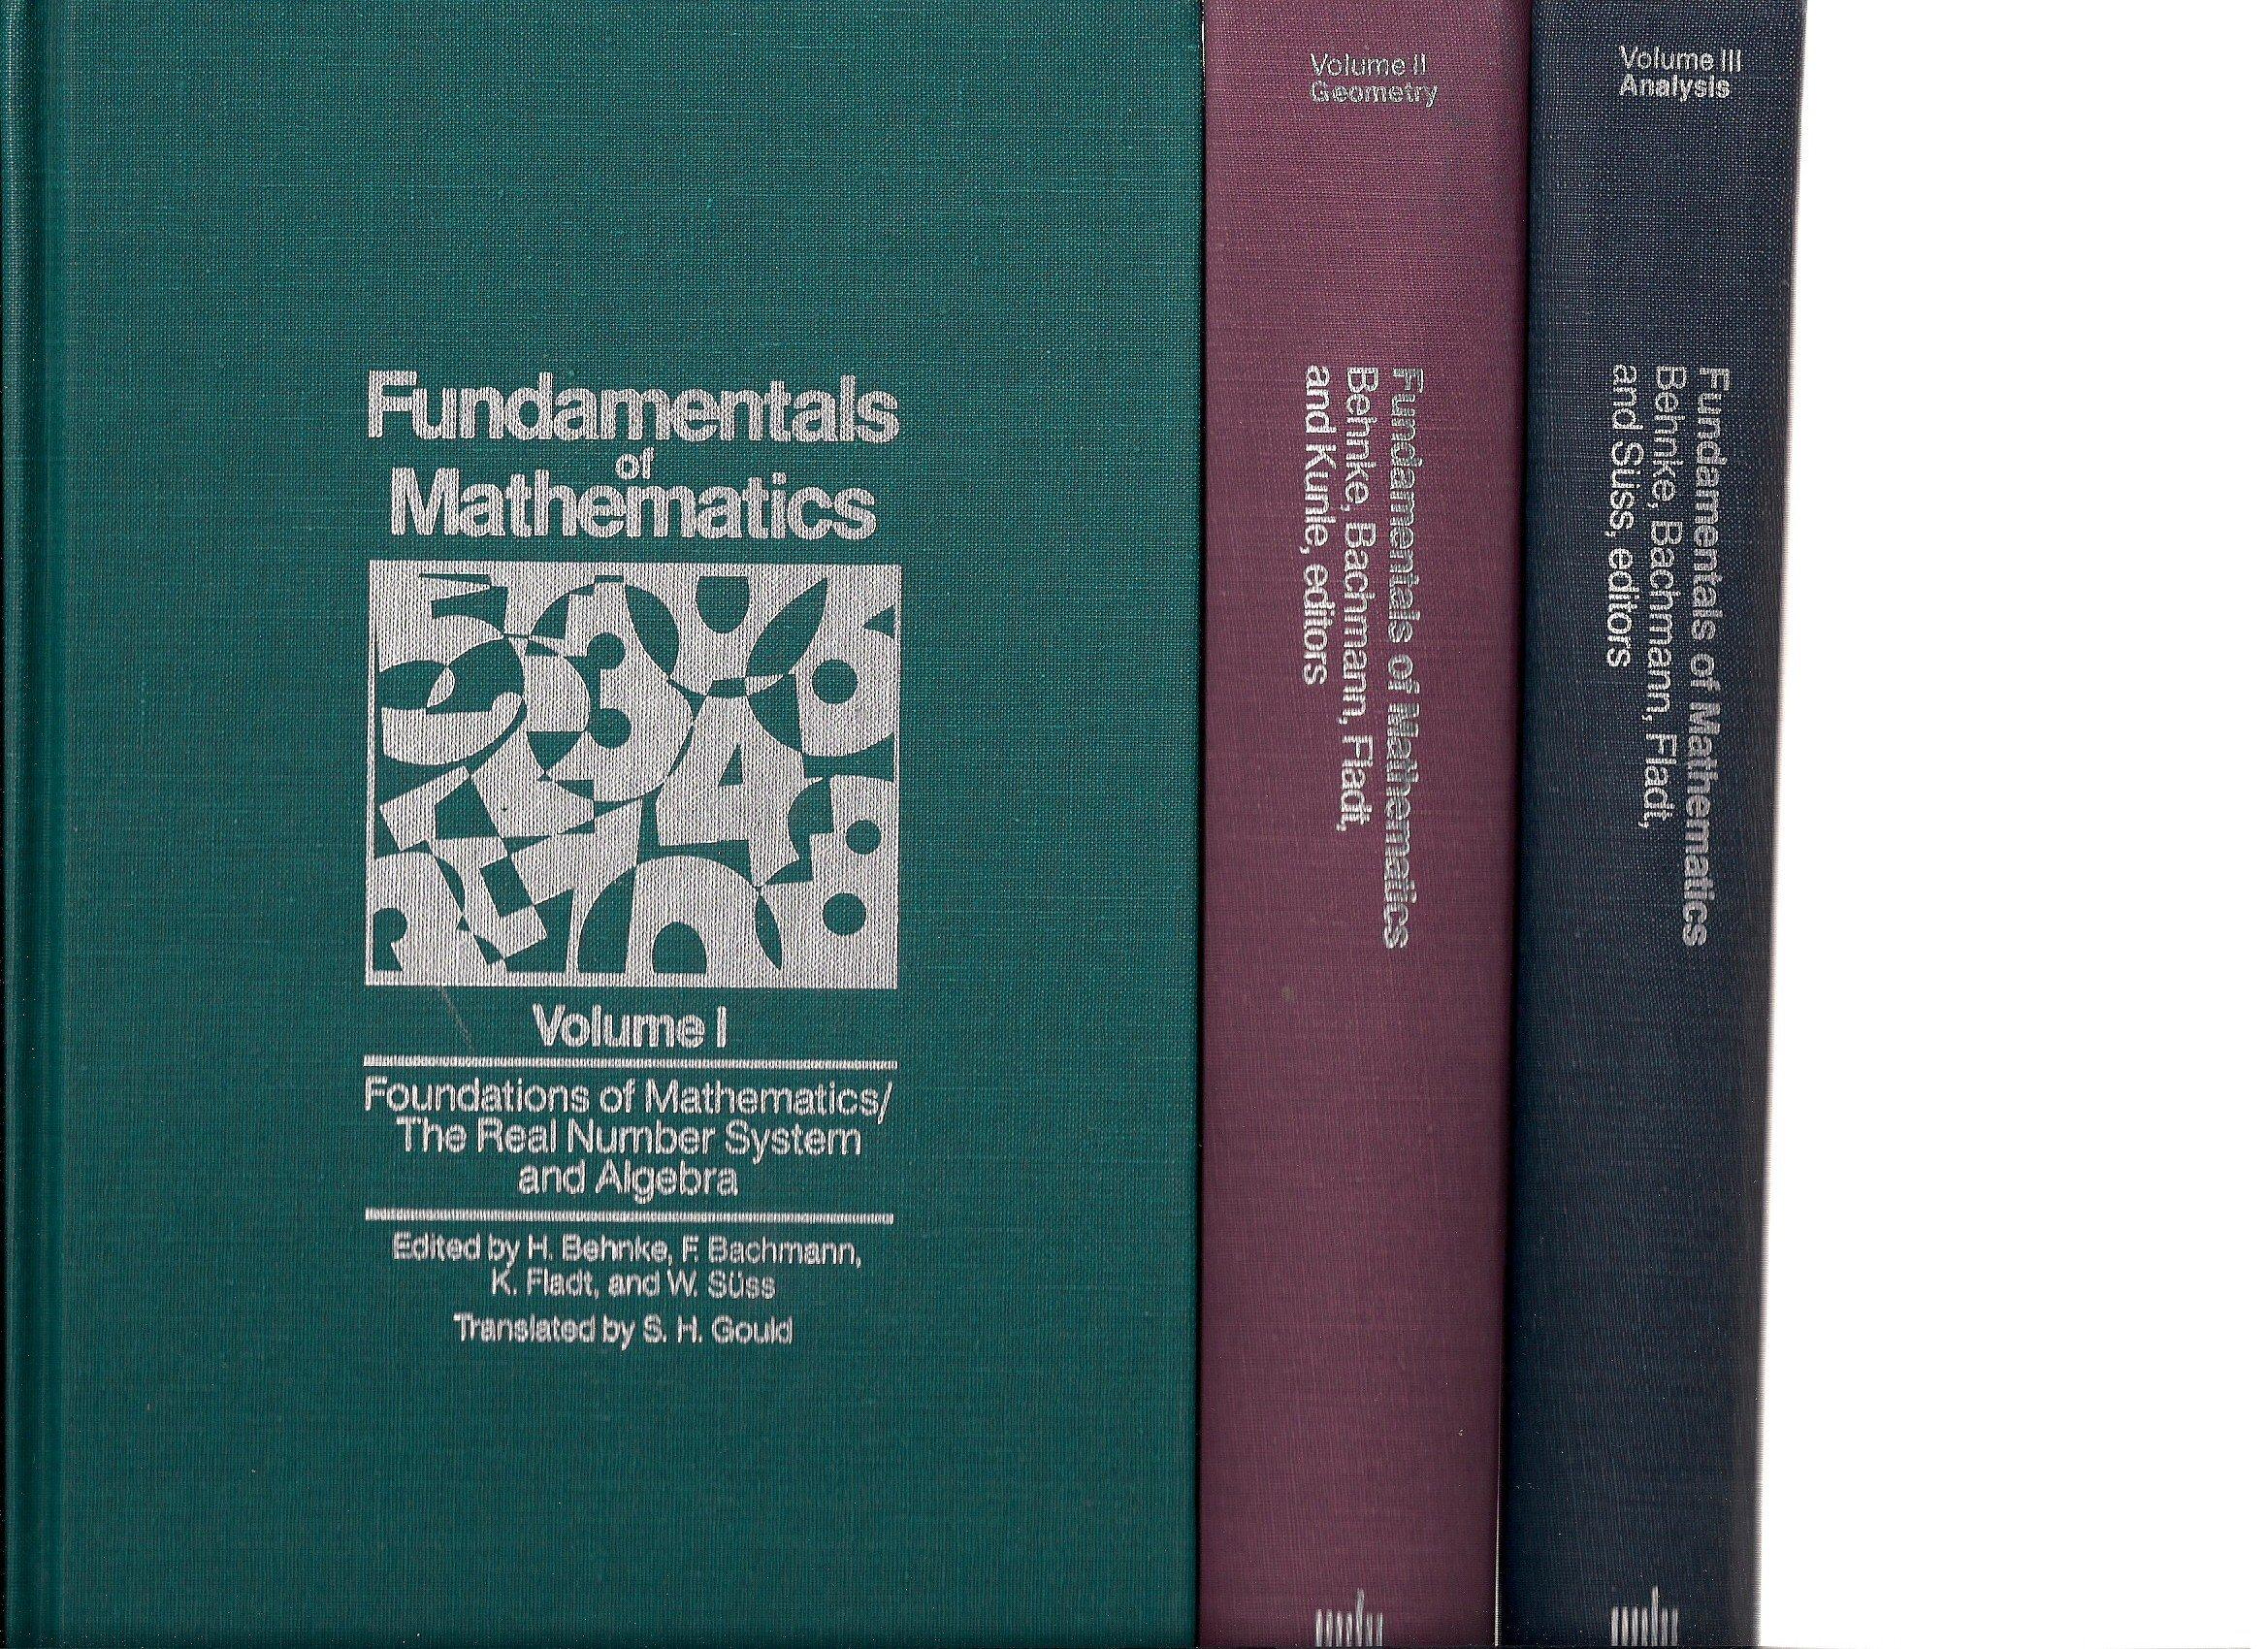 Fundamentals of Mathematics, 3 Volume Set: Volume I: Foundation of